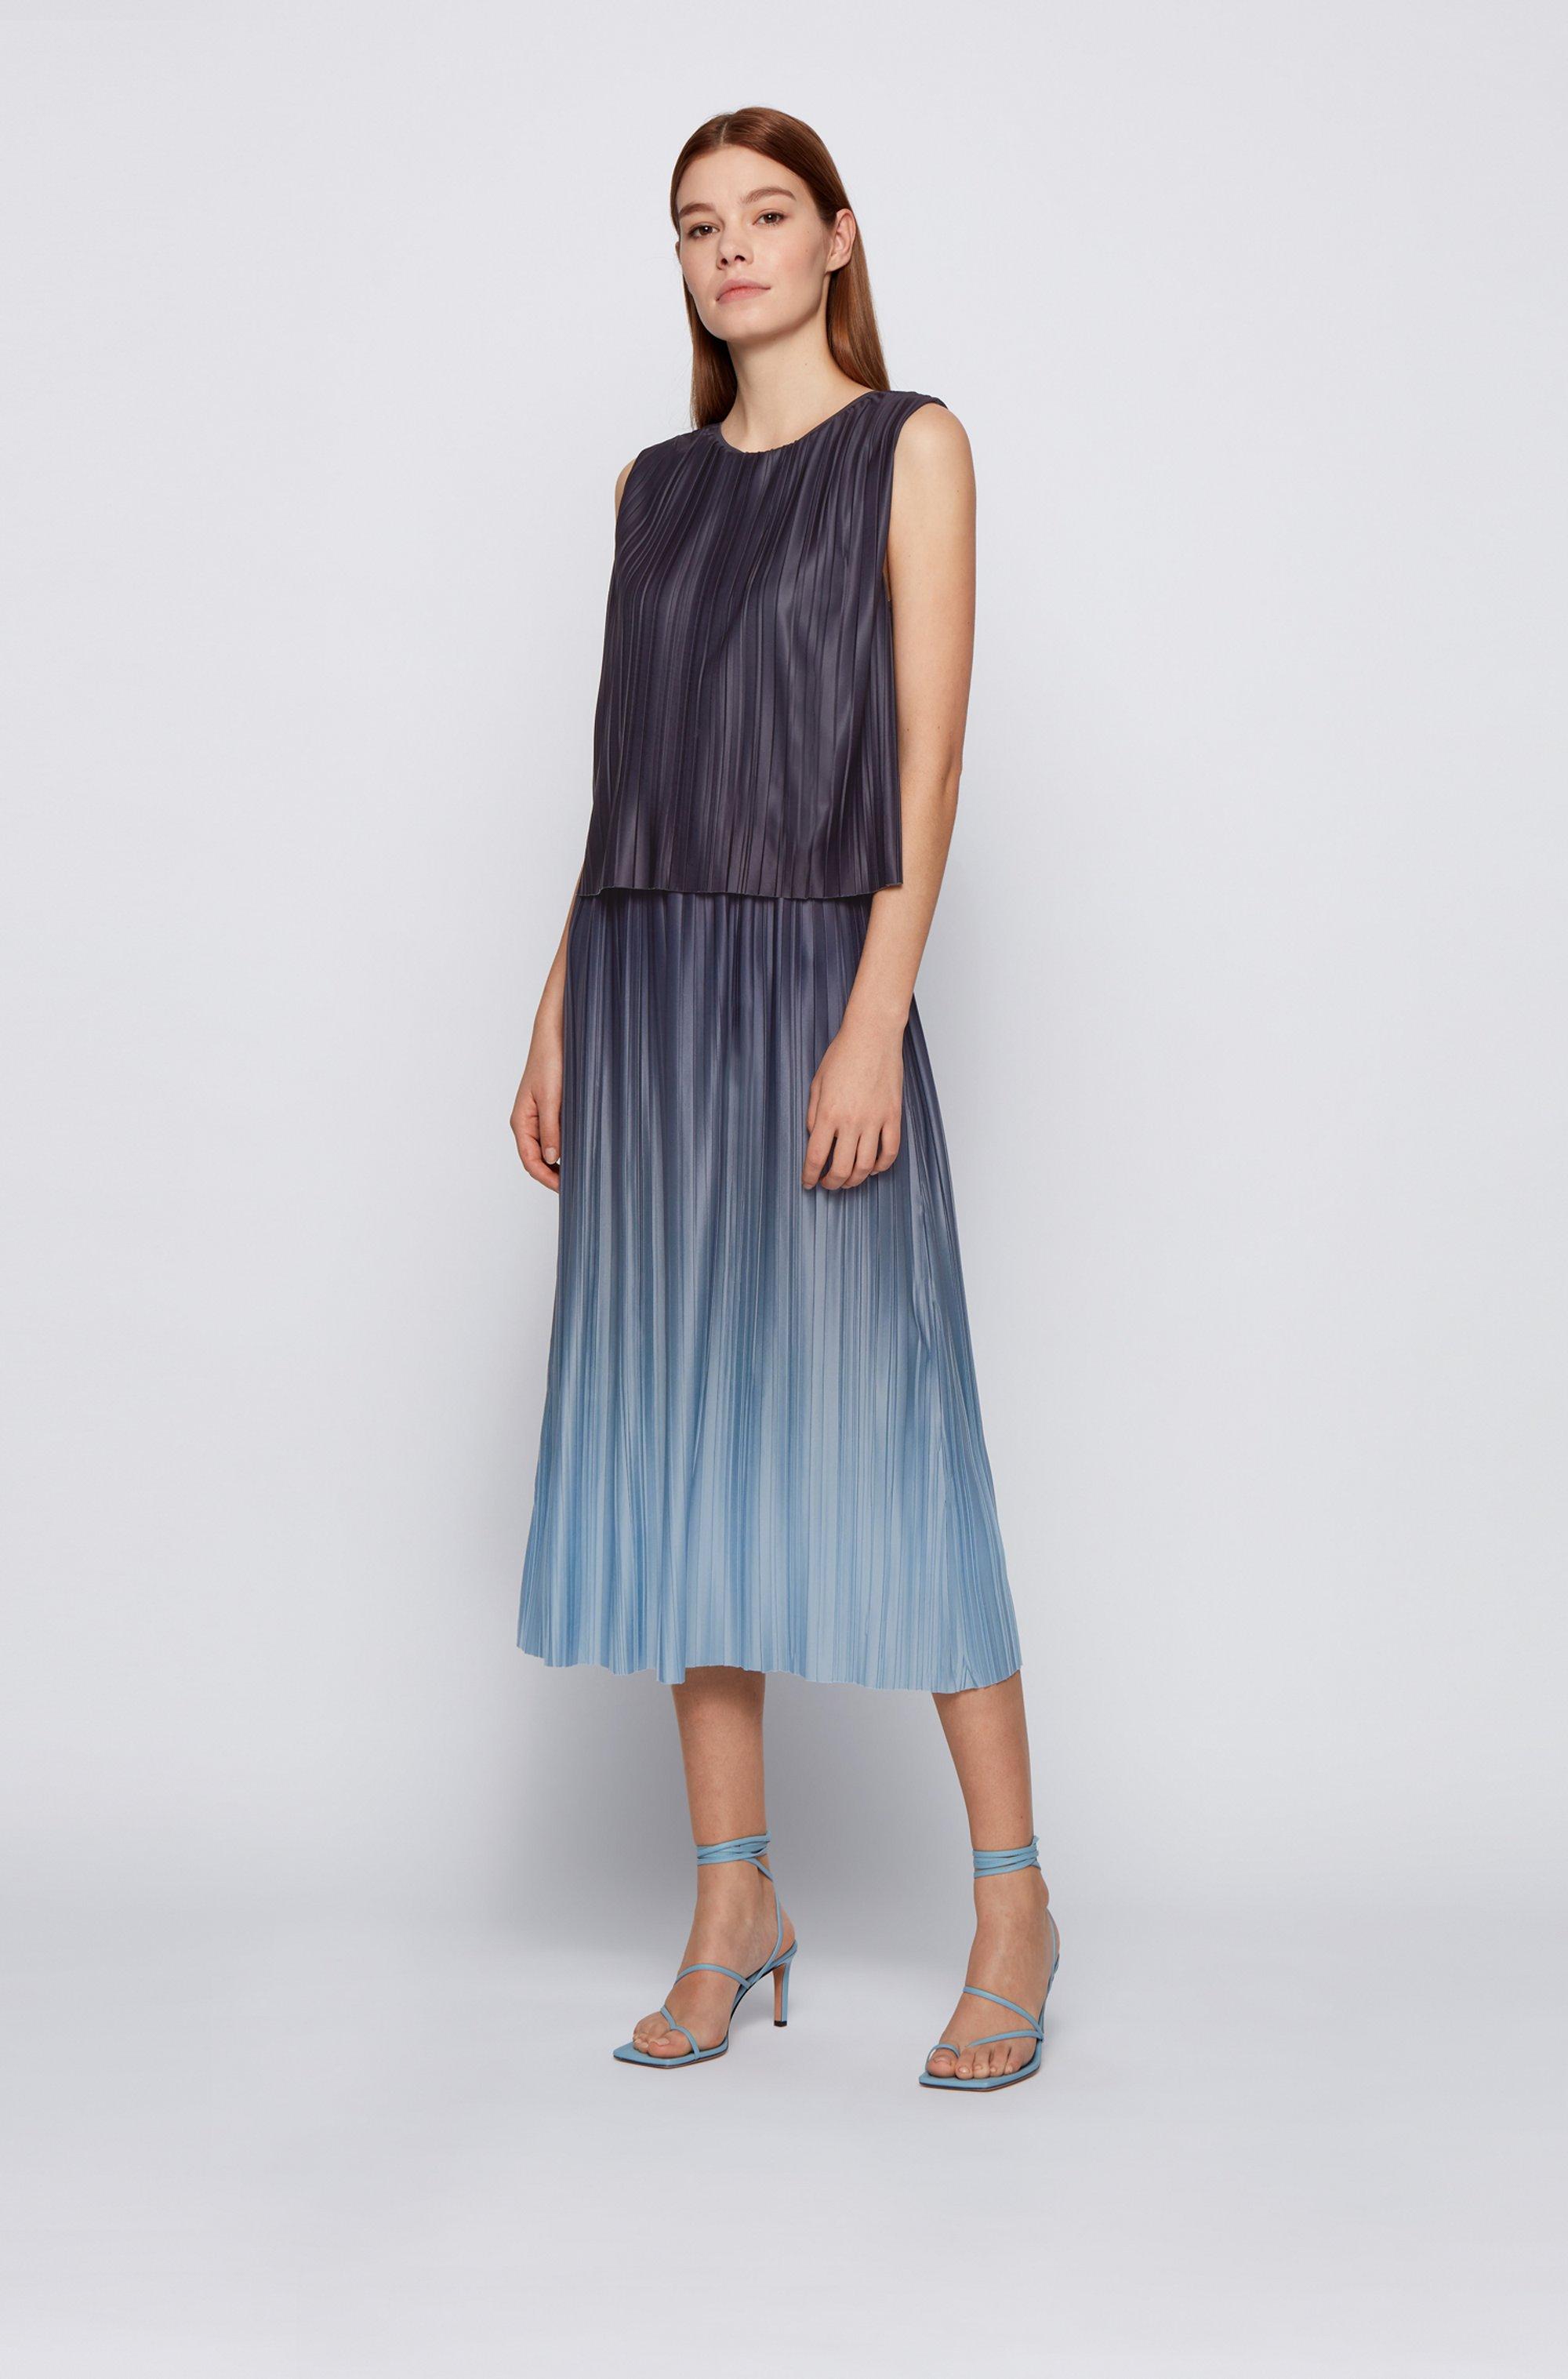 Layered degradé dress in Italian plissé fabric